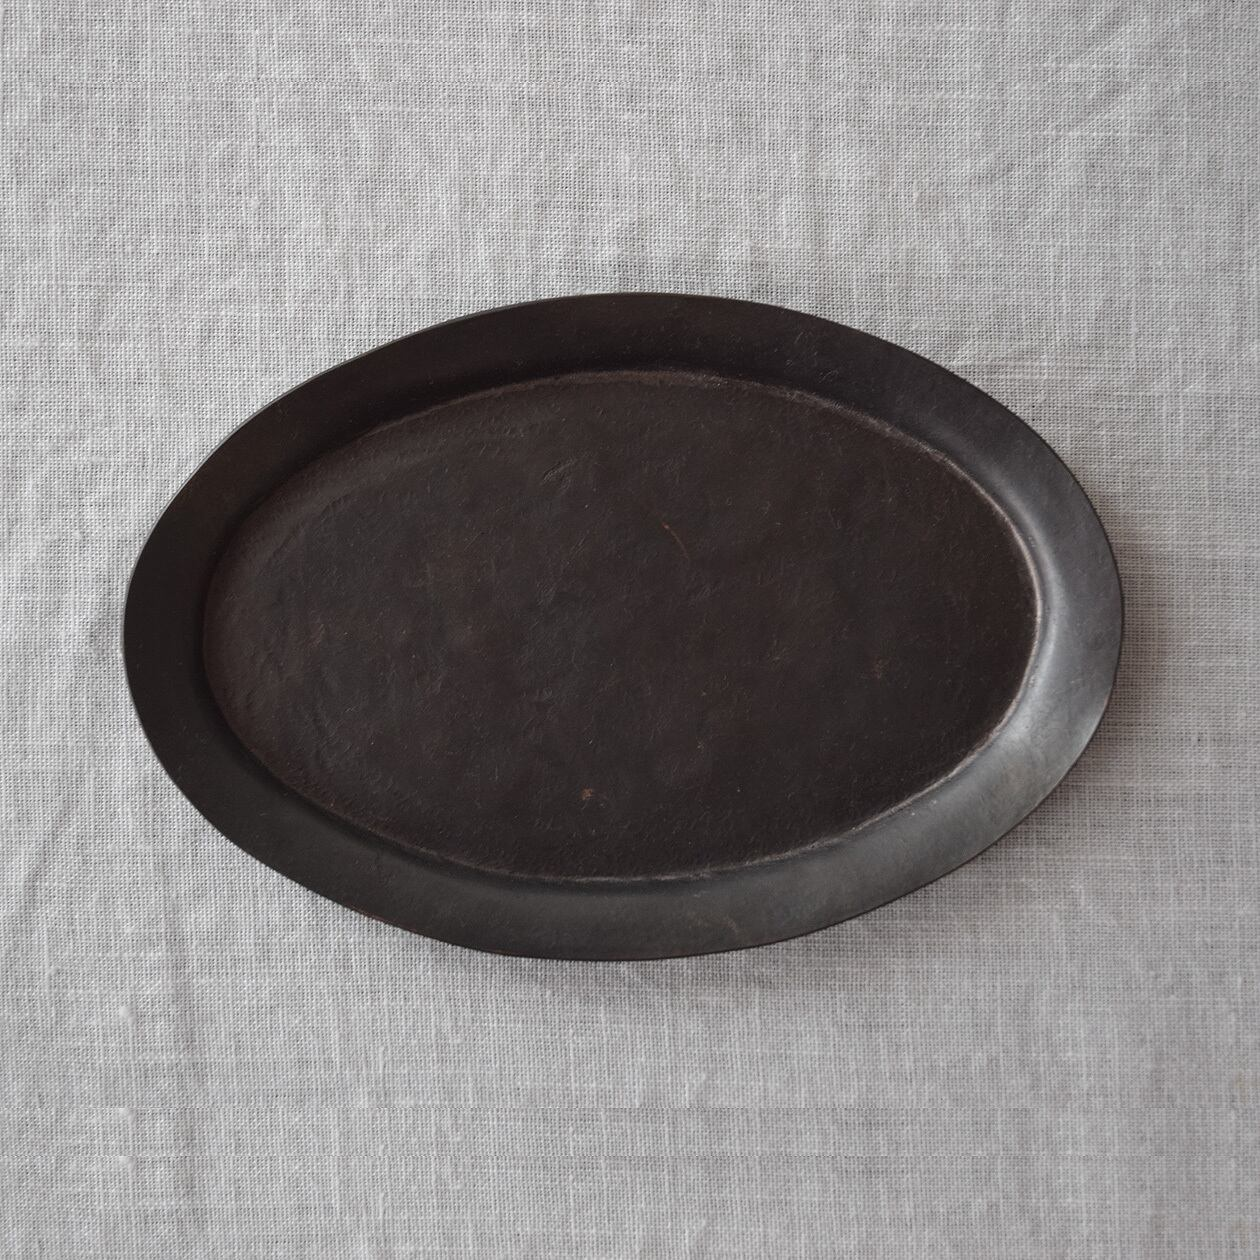 三輪周太郎 Shutaro Miwa  銅製楕円リム皿 a